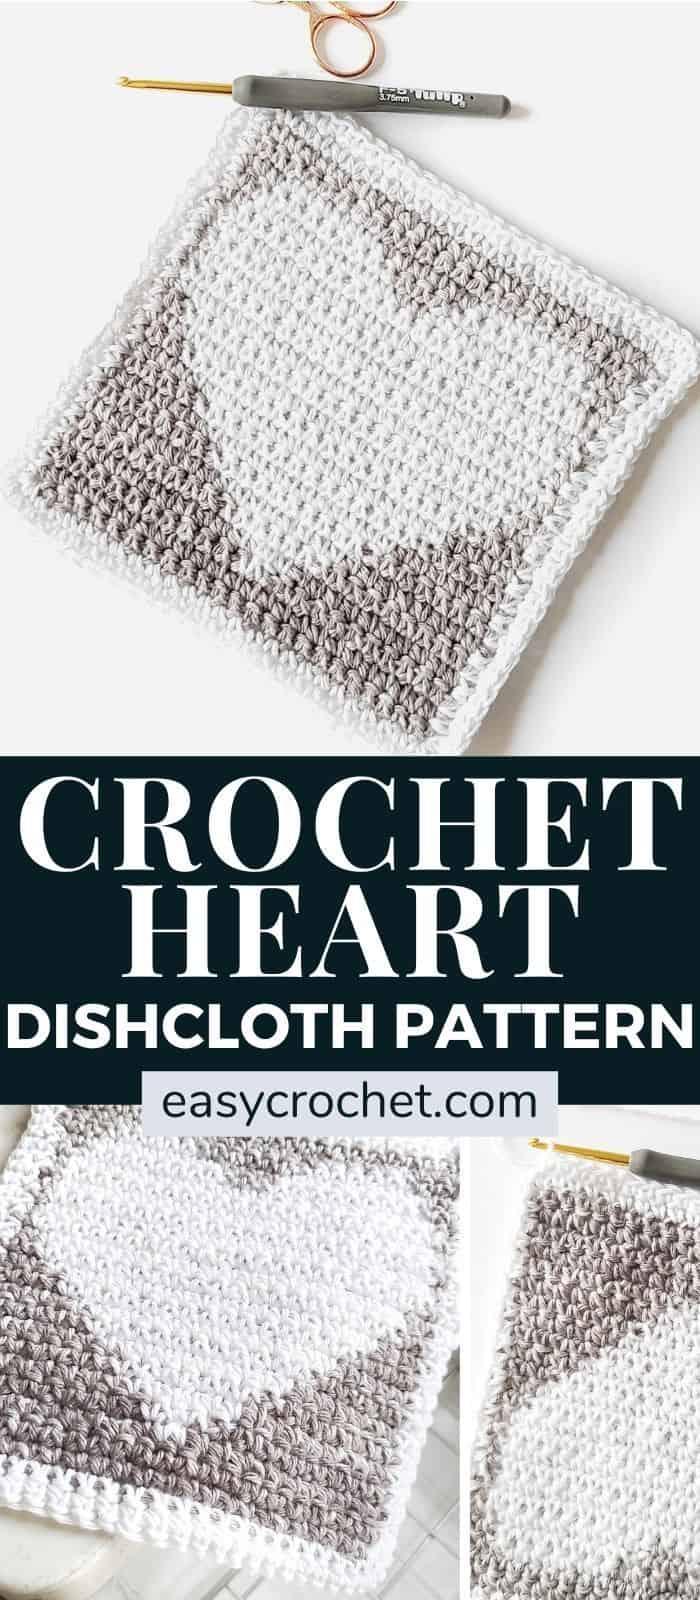 Free and Easy Crochet Heart Dishcloth Pattern